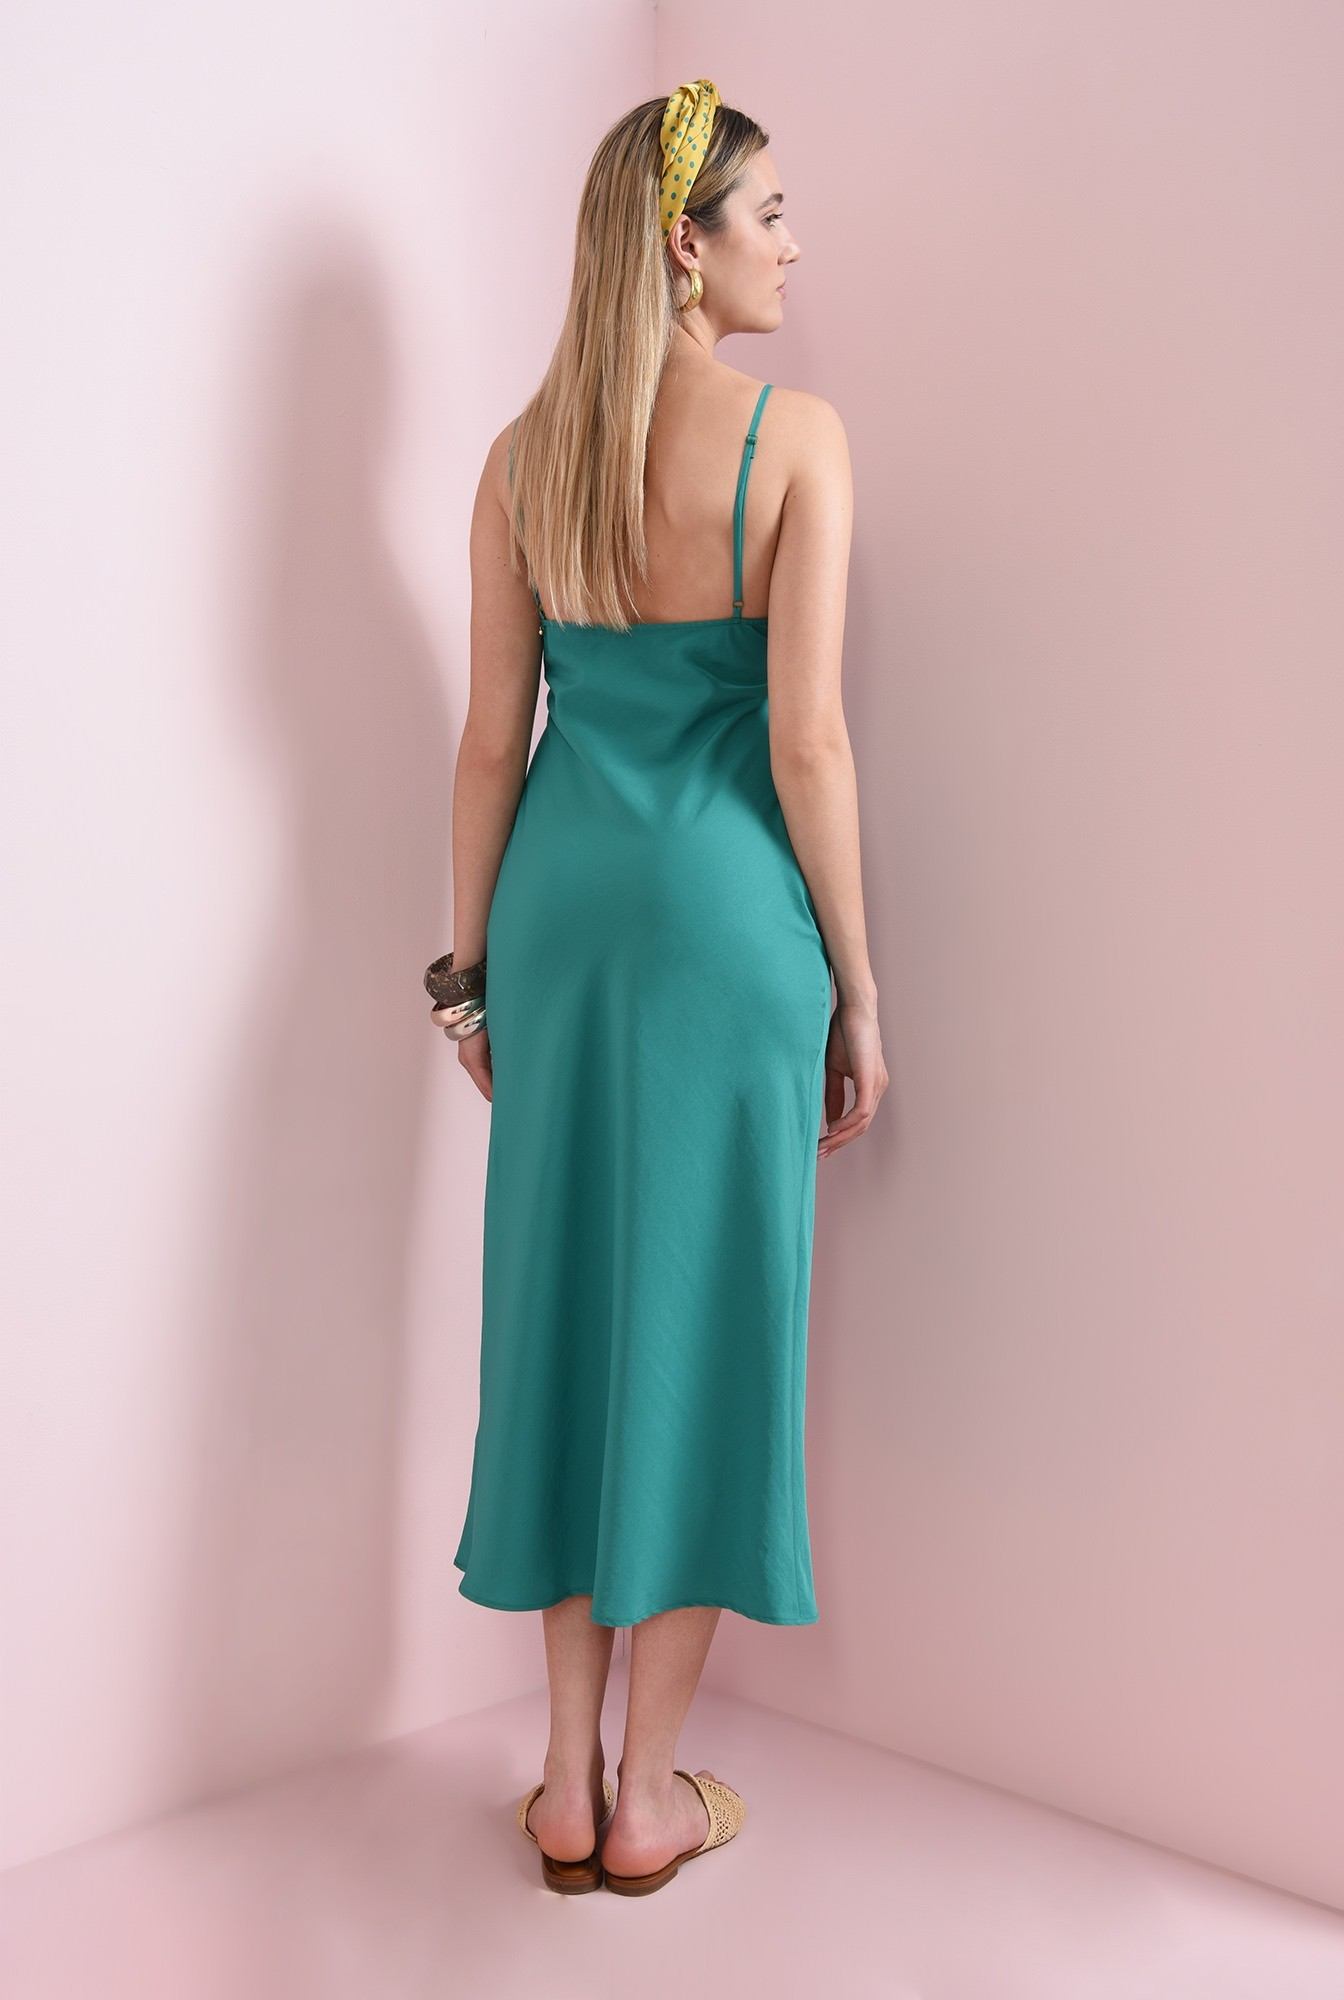 2 - rochie verde, midi, cu bretele